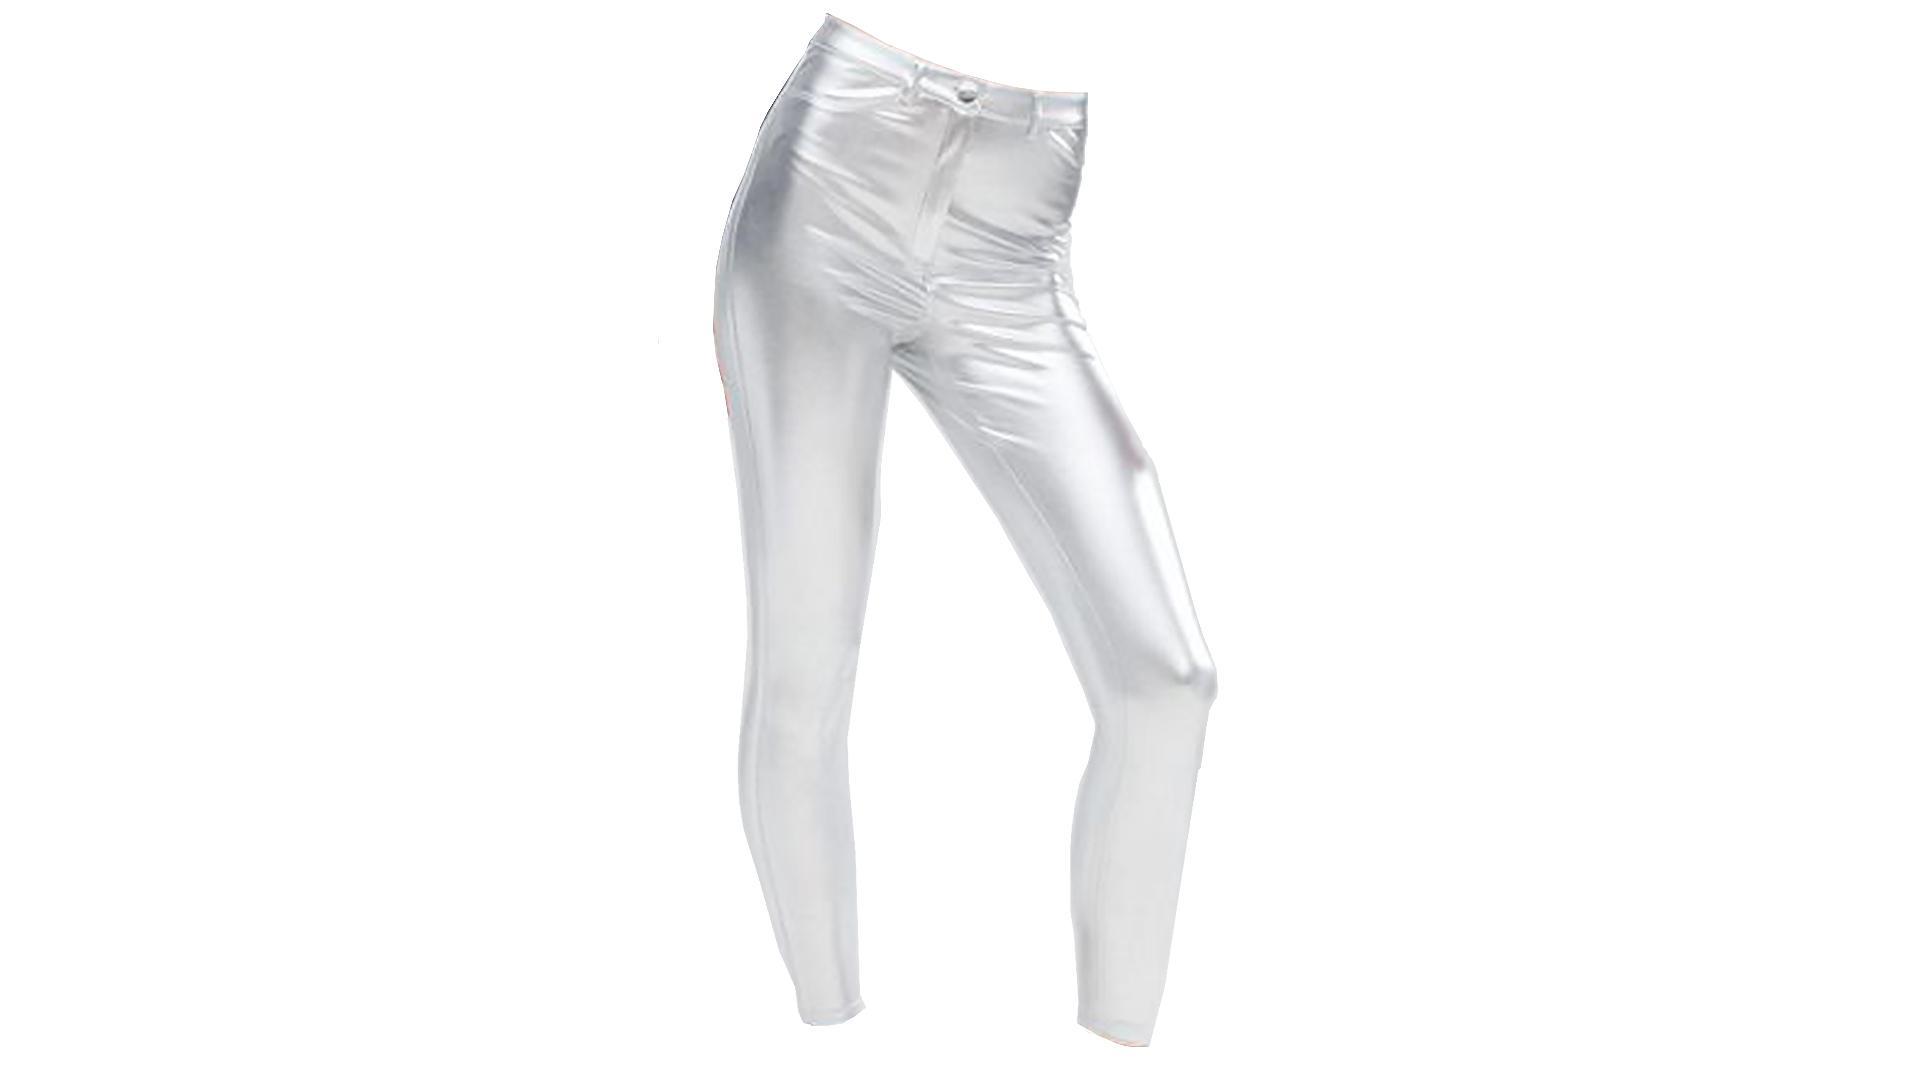 High Waist Shimmer Pants - Lady Leshurr - Juice